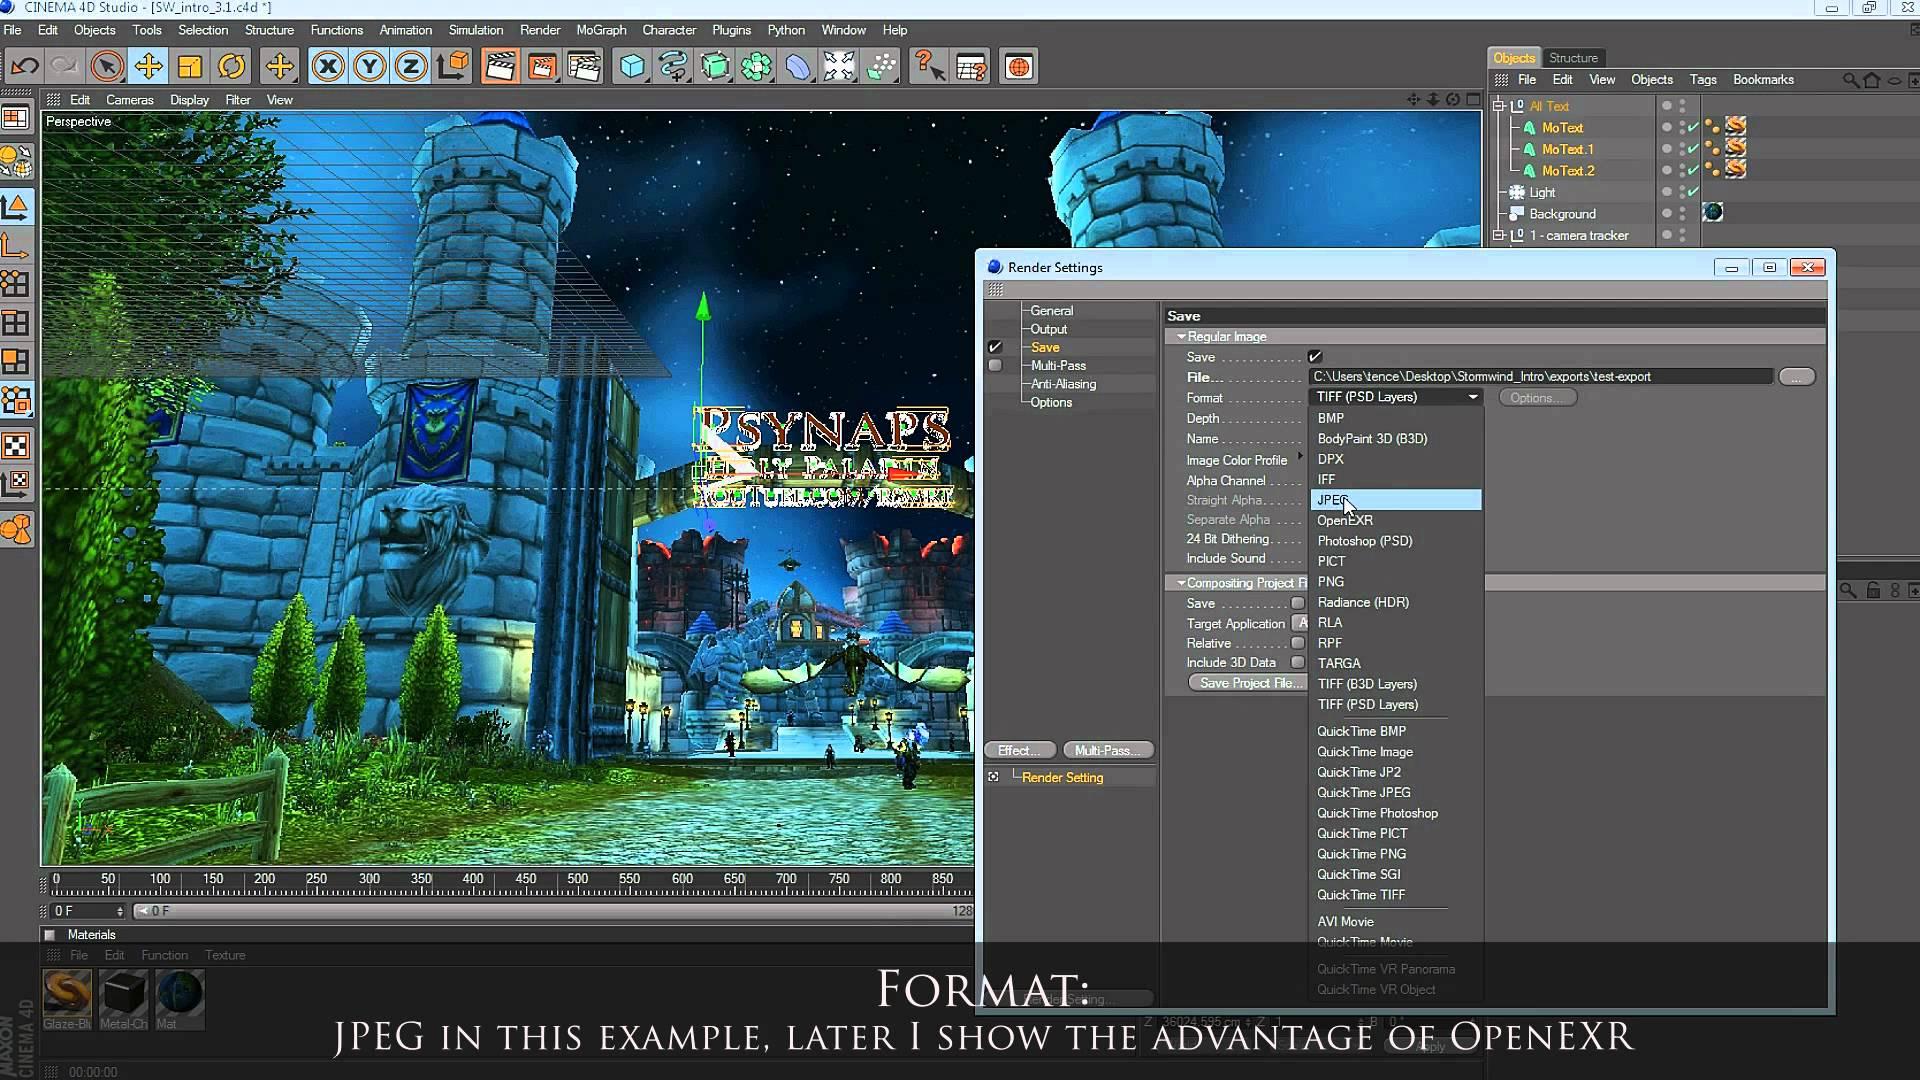 AE Tutorial: Cinema 4D & After Effects CS6 3D Camera Tracker – Part I